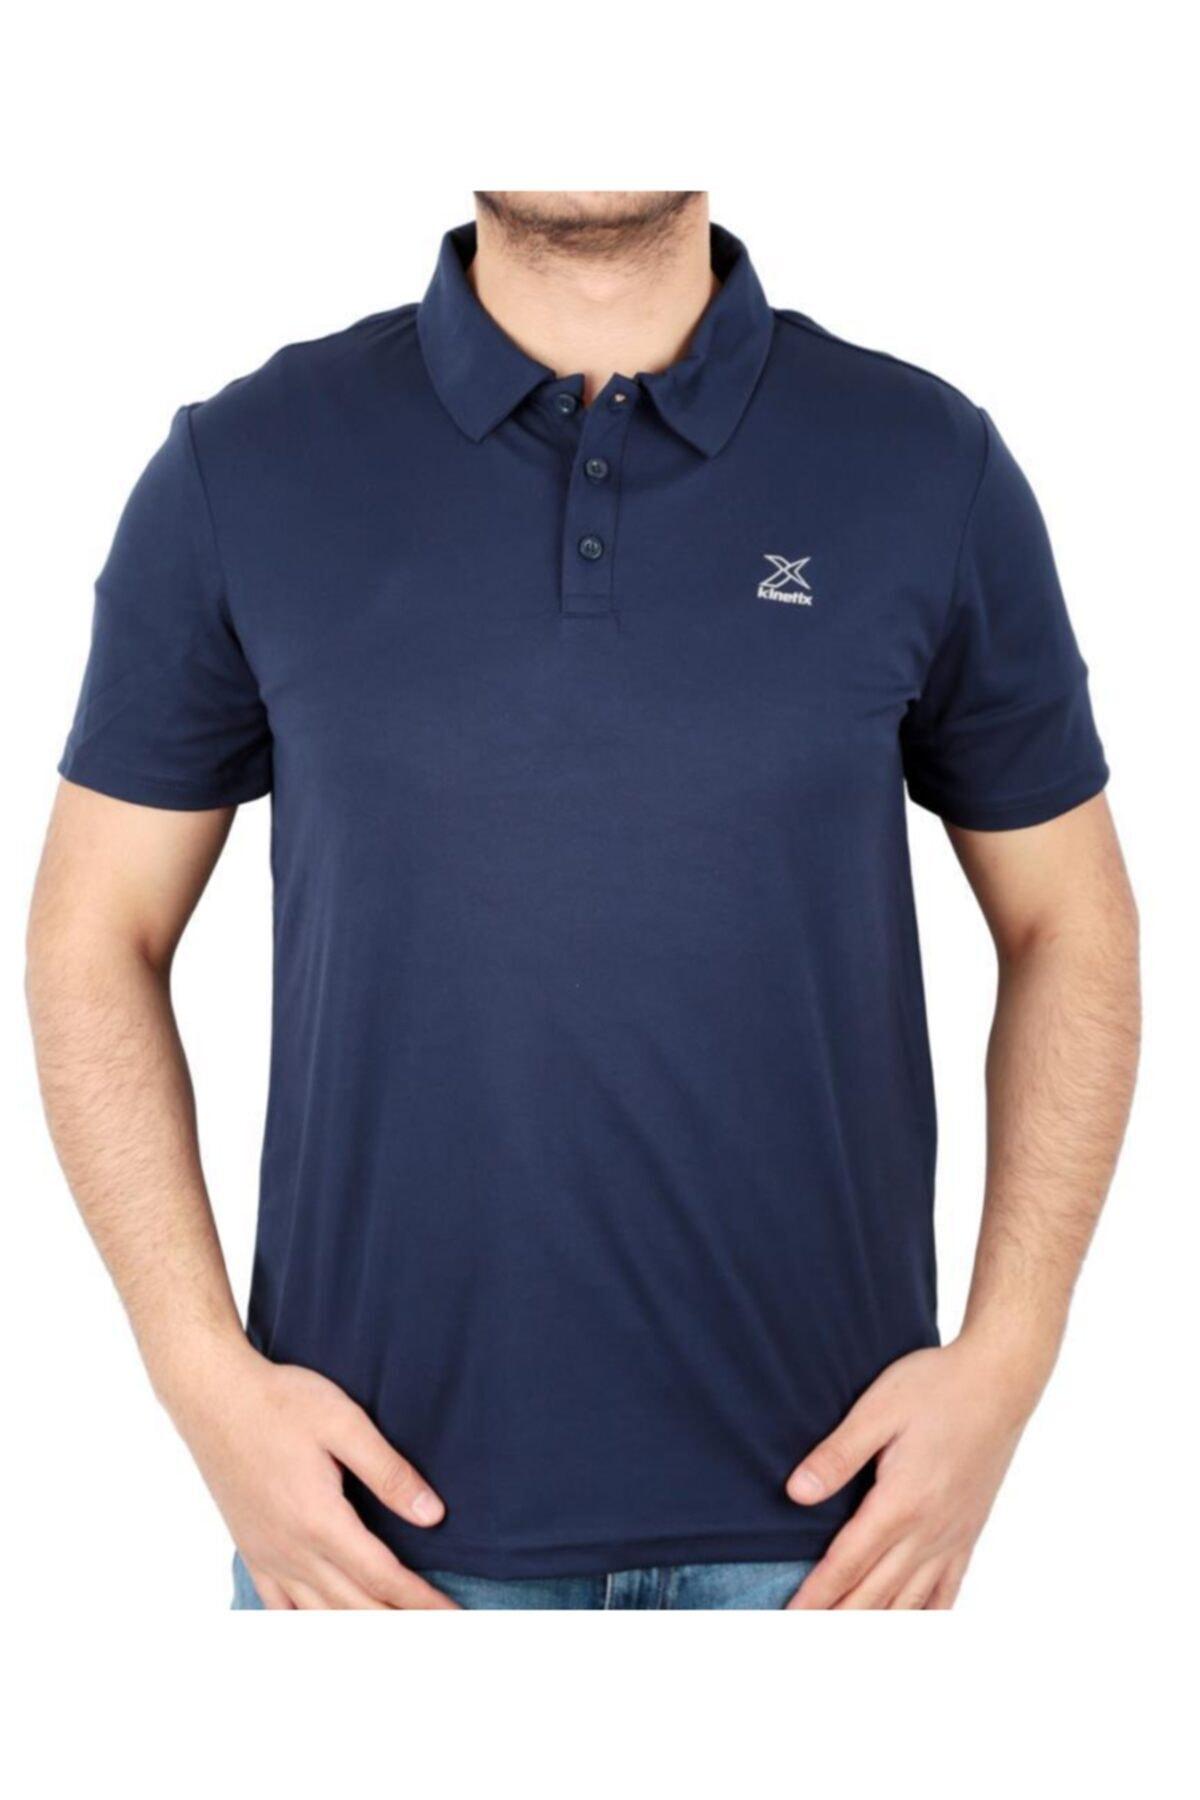 SN328 OLIVER POLO T-SHIRT Lacivert Erkek T-Shirt 100583094